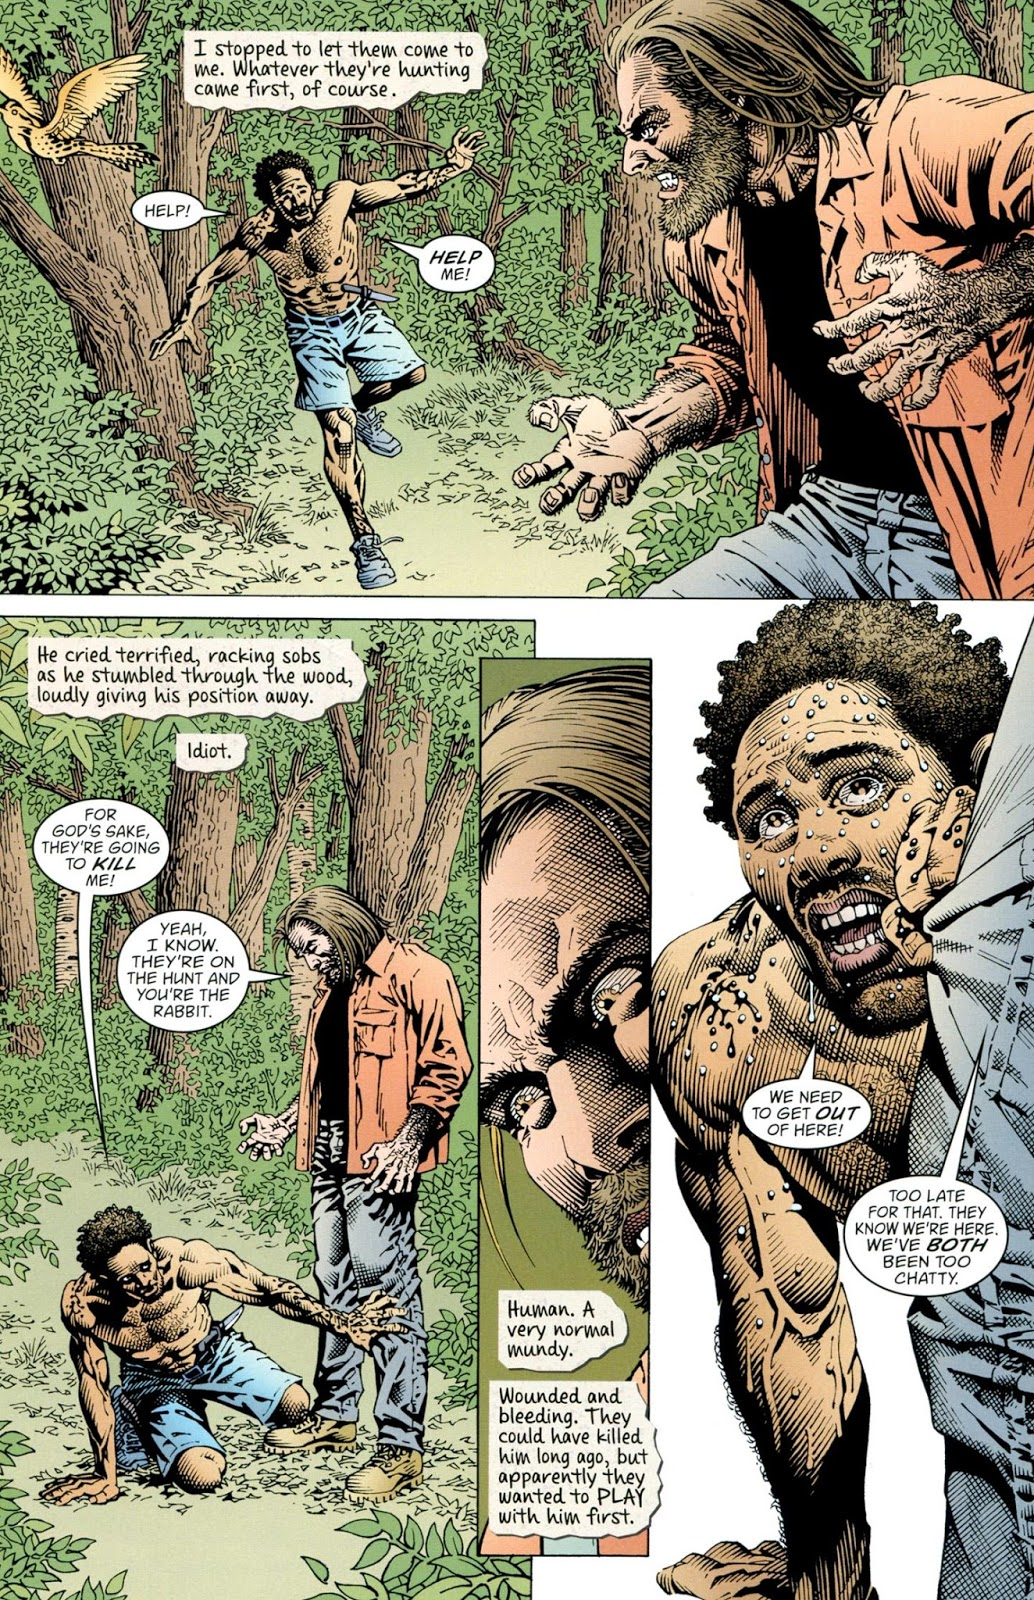 Male Transformations: Ferals (Werewolf Transformations)